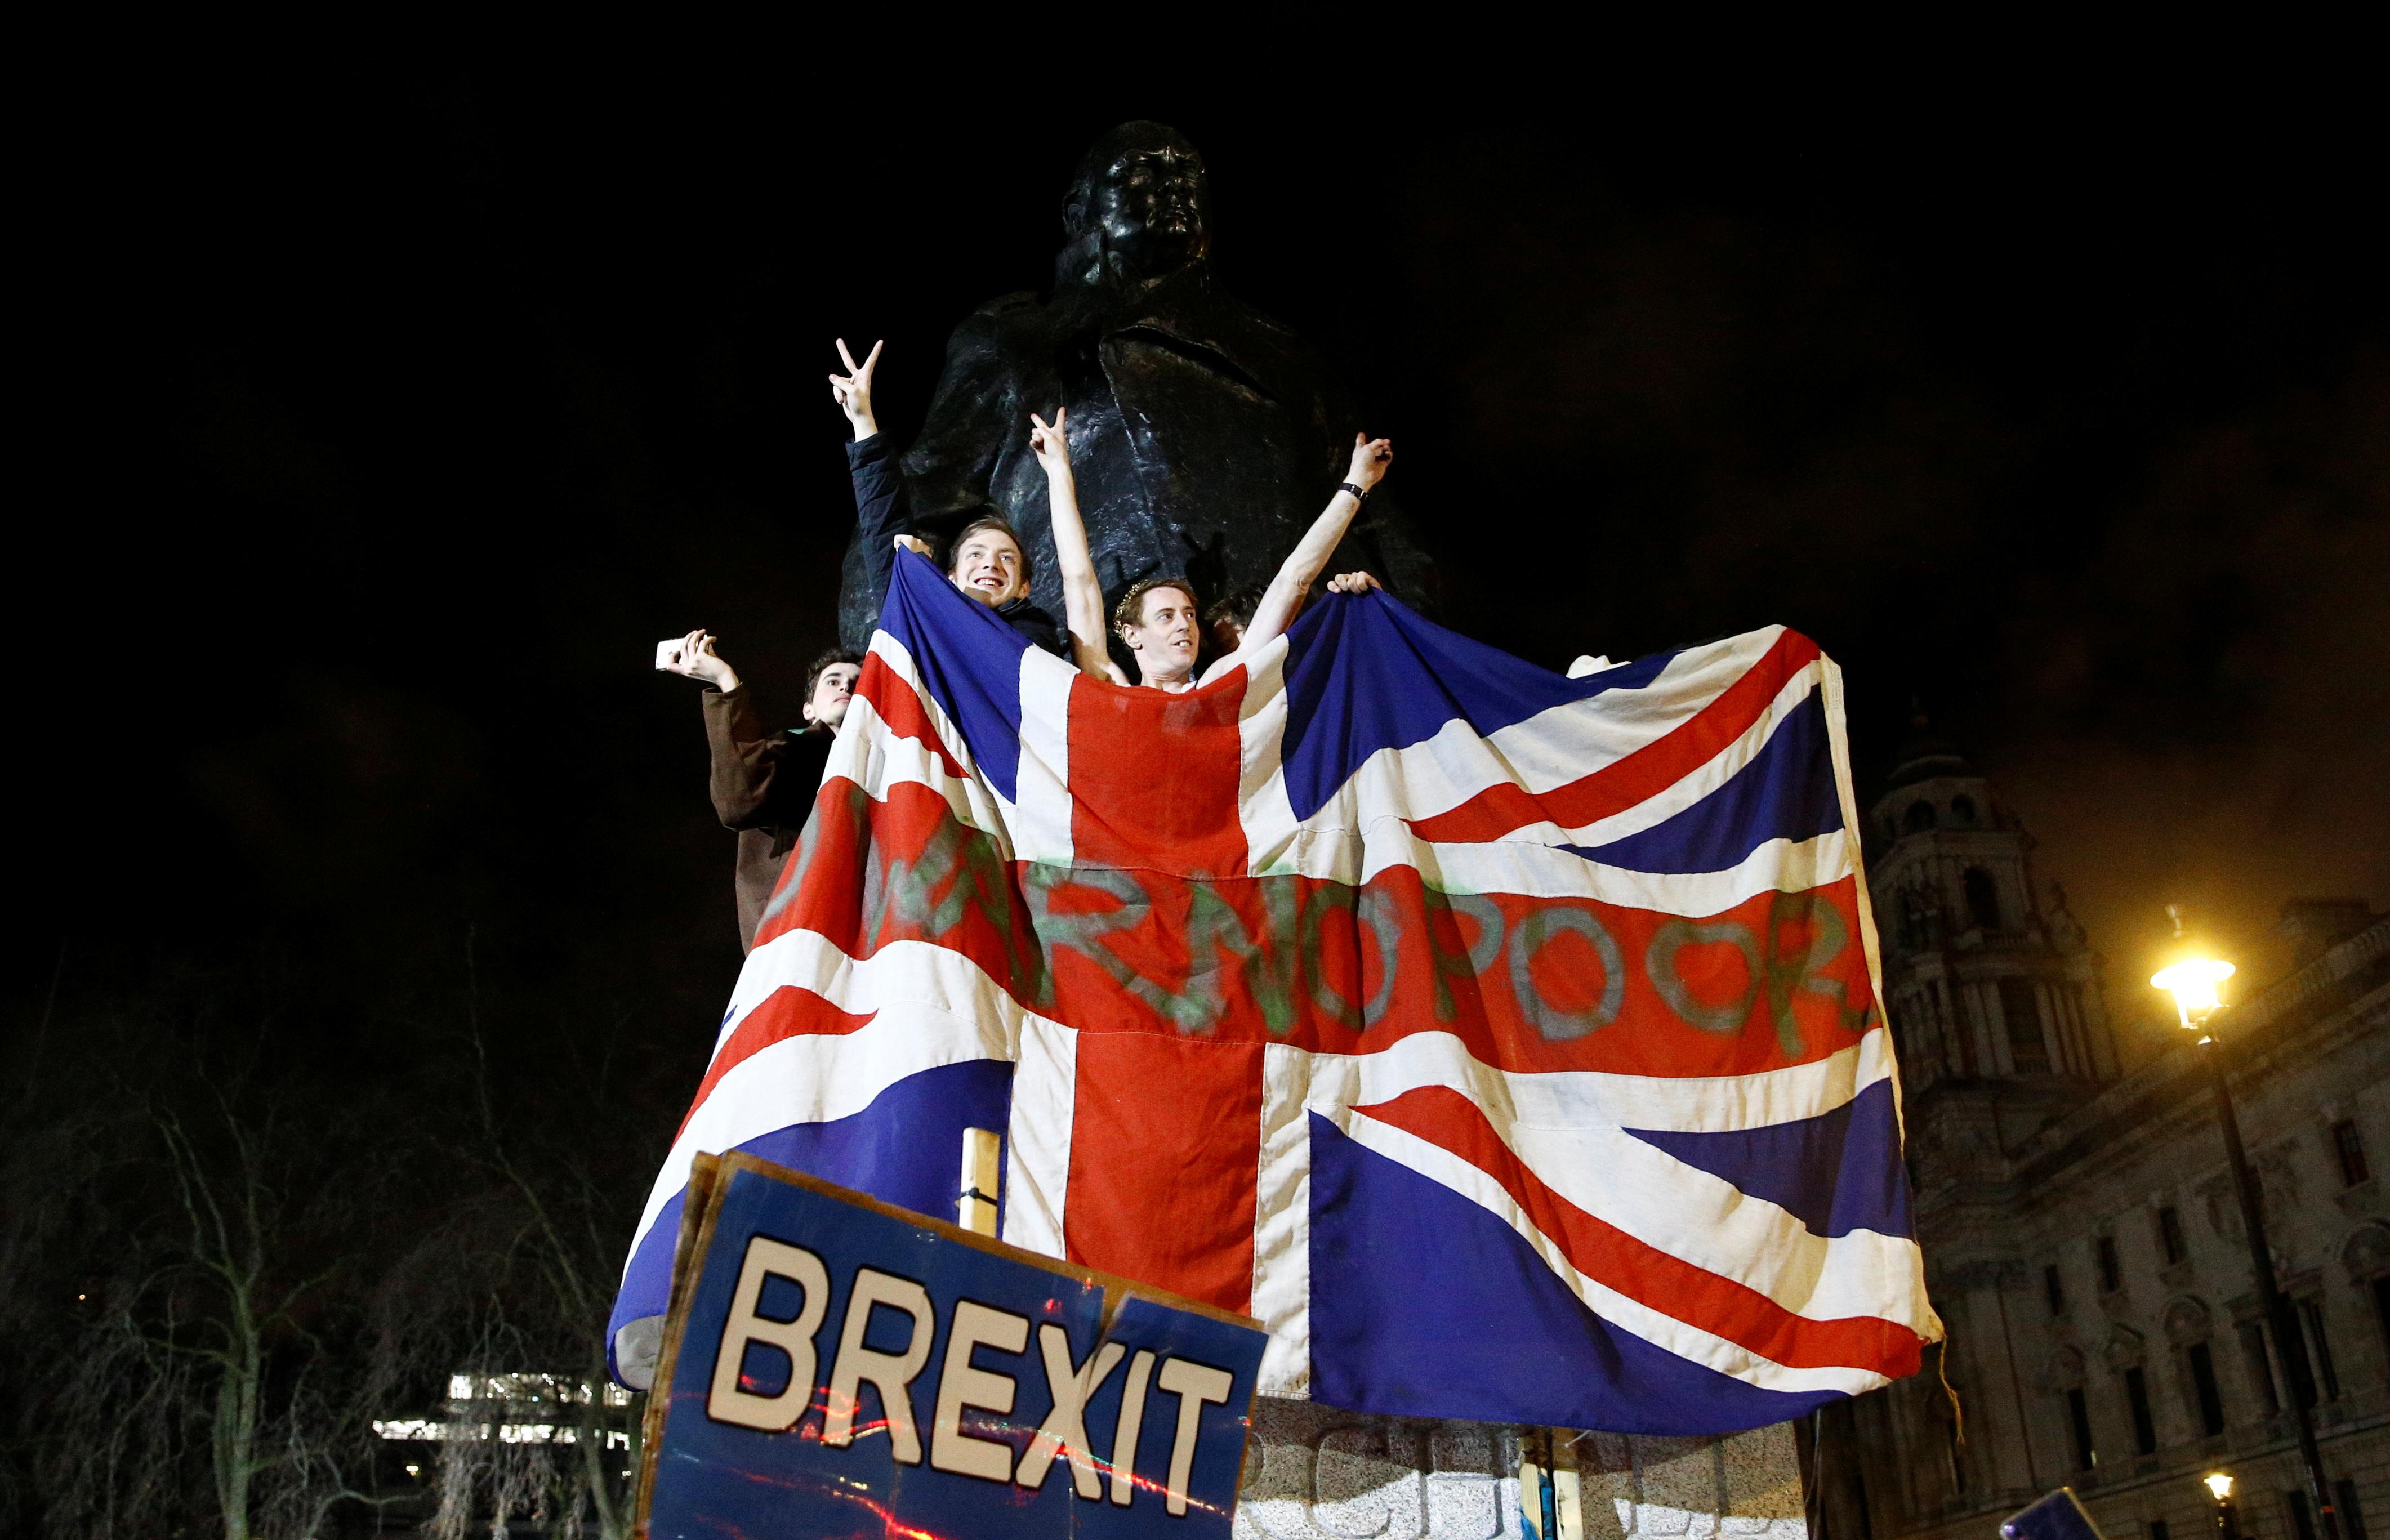 Brexit: Παράταση στις σχέσεις με την ΕΕ ζητούν Σκωτία και Ουαλία